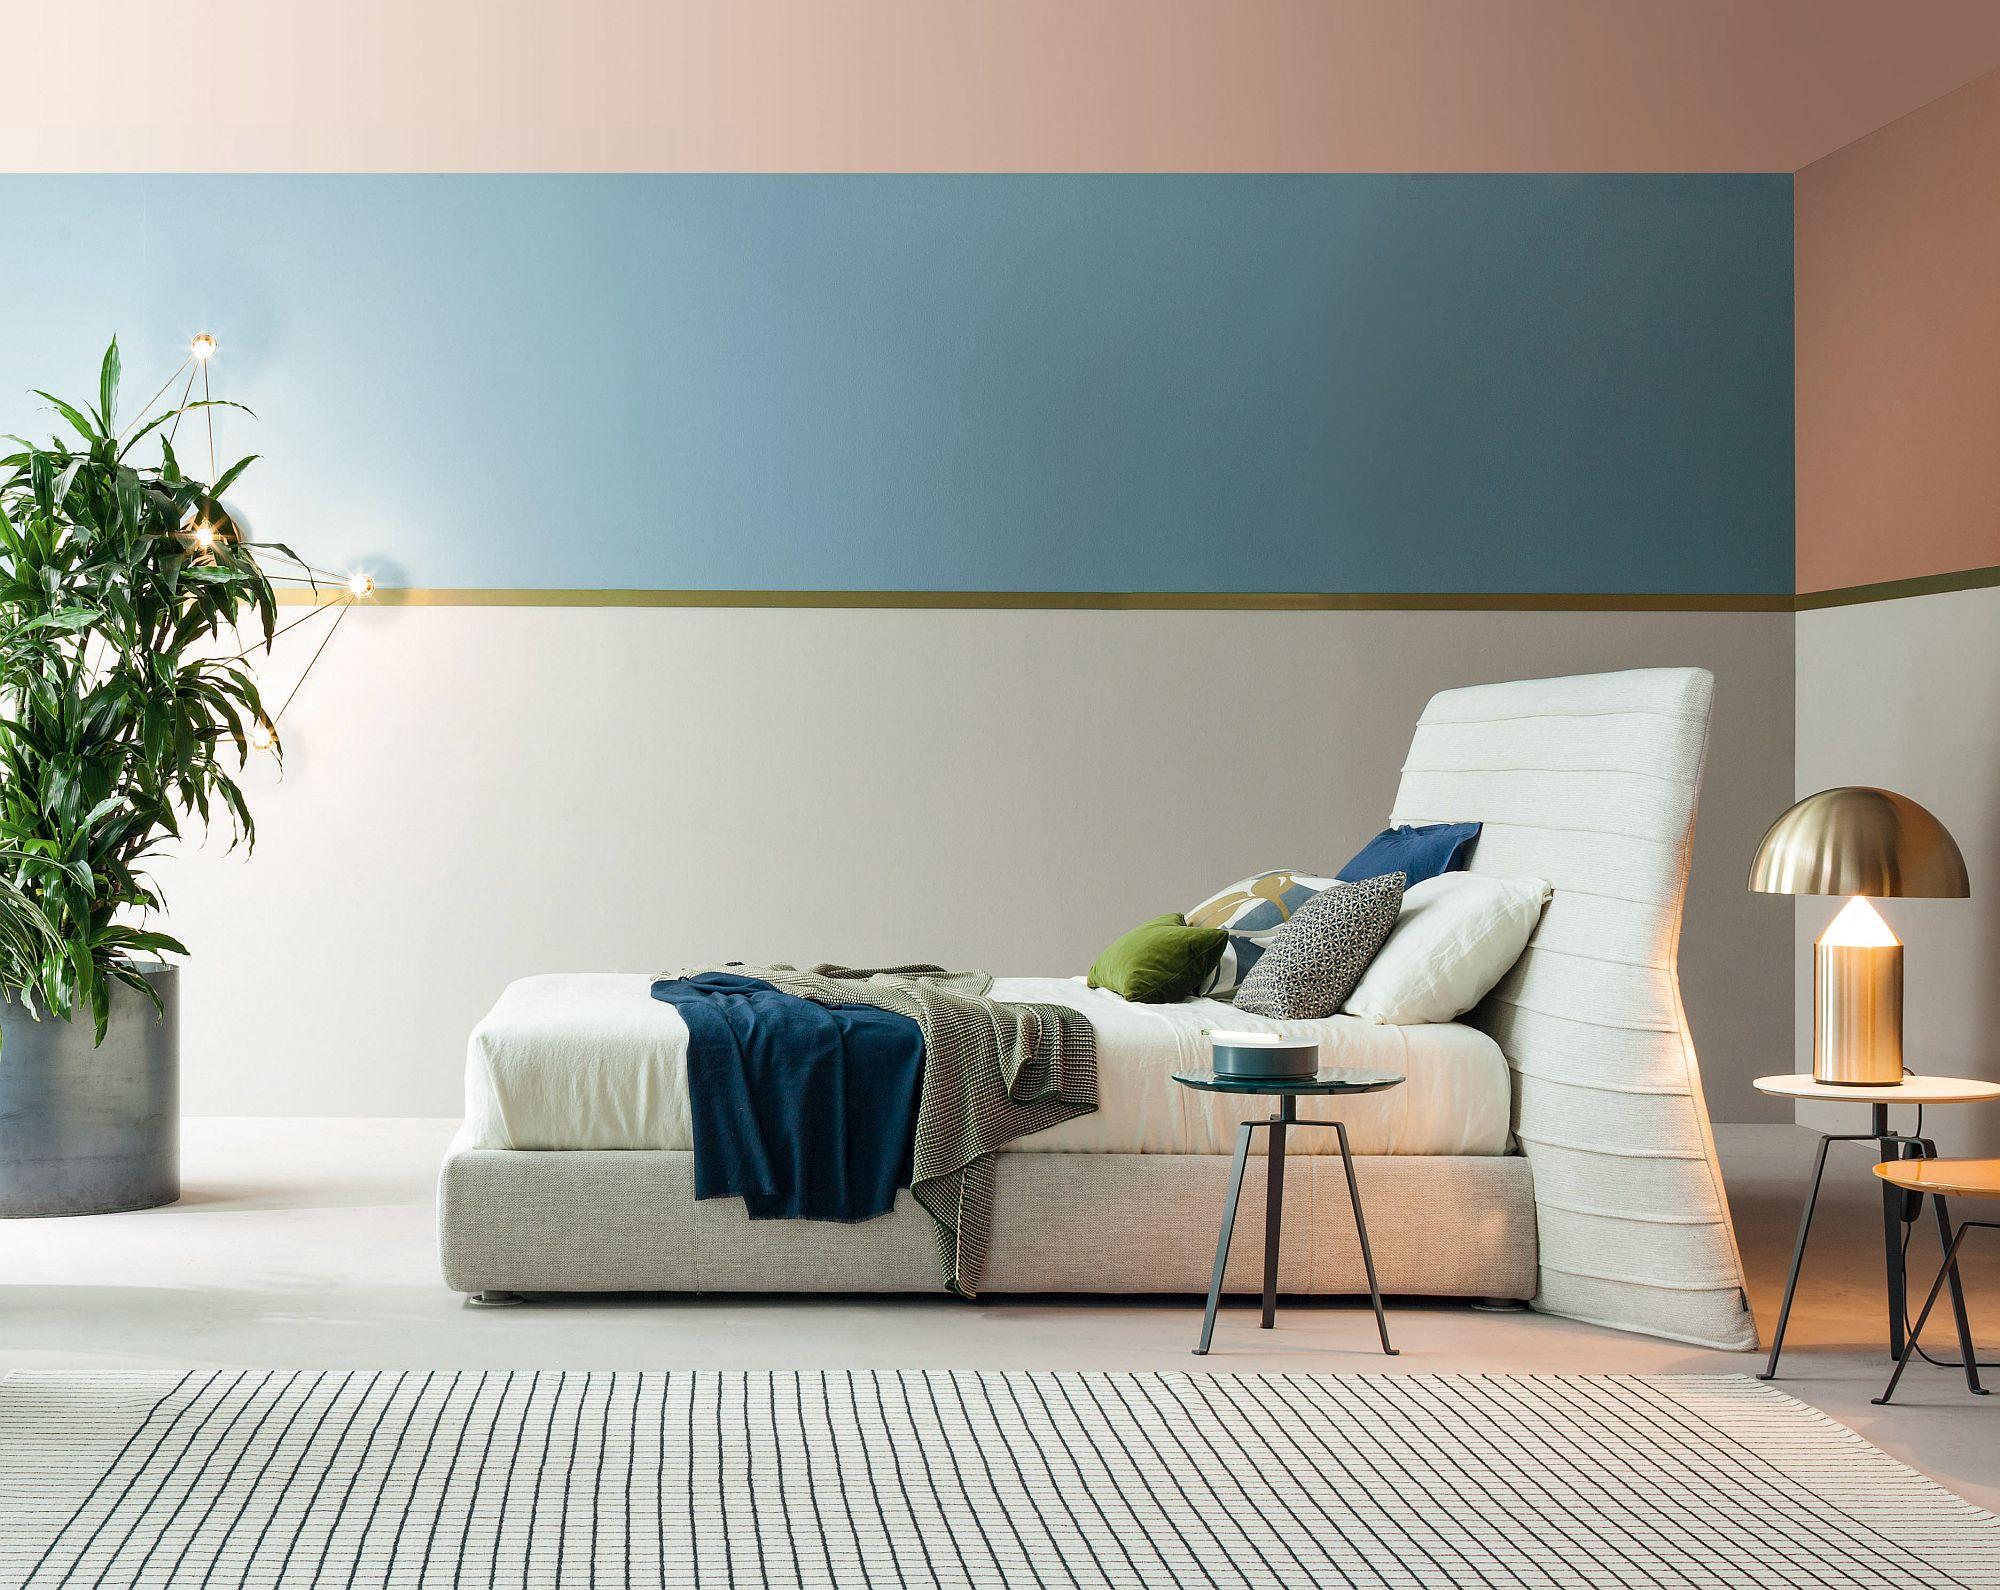 Slim-and-elegant-bed-designed-by-Mauro-Lipparini